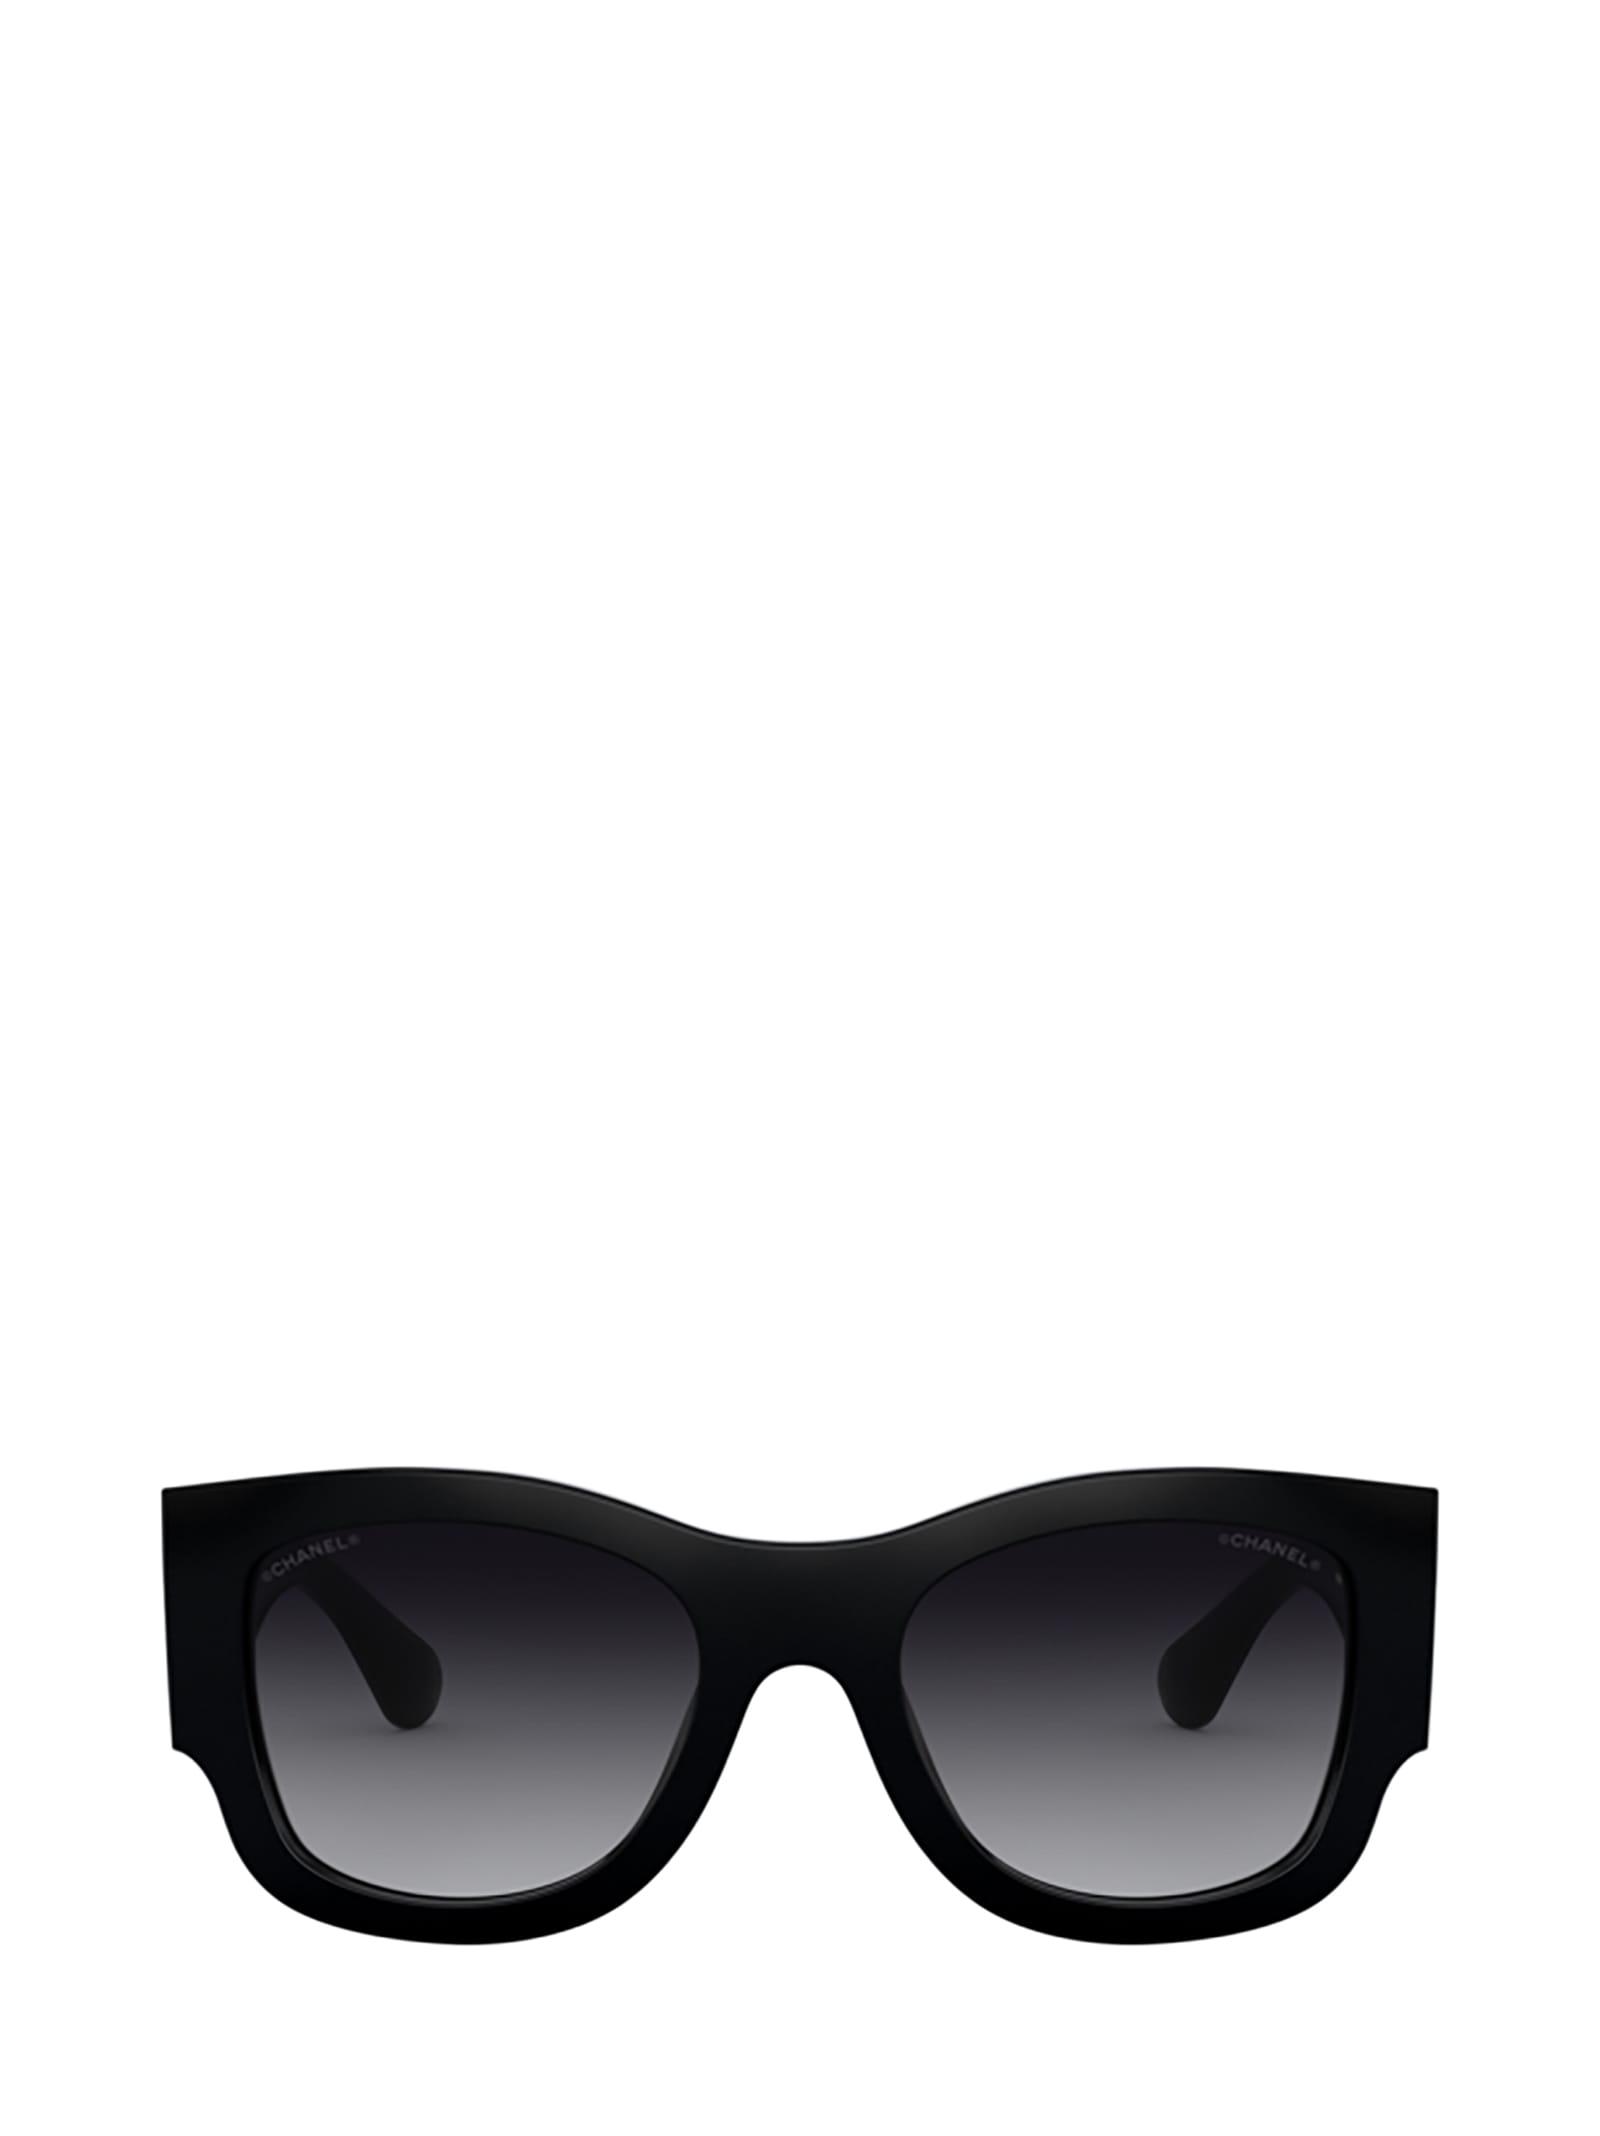 Chanel Chanel Ch5421b Black Sunglasses